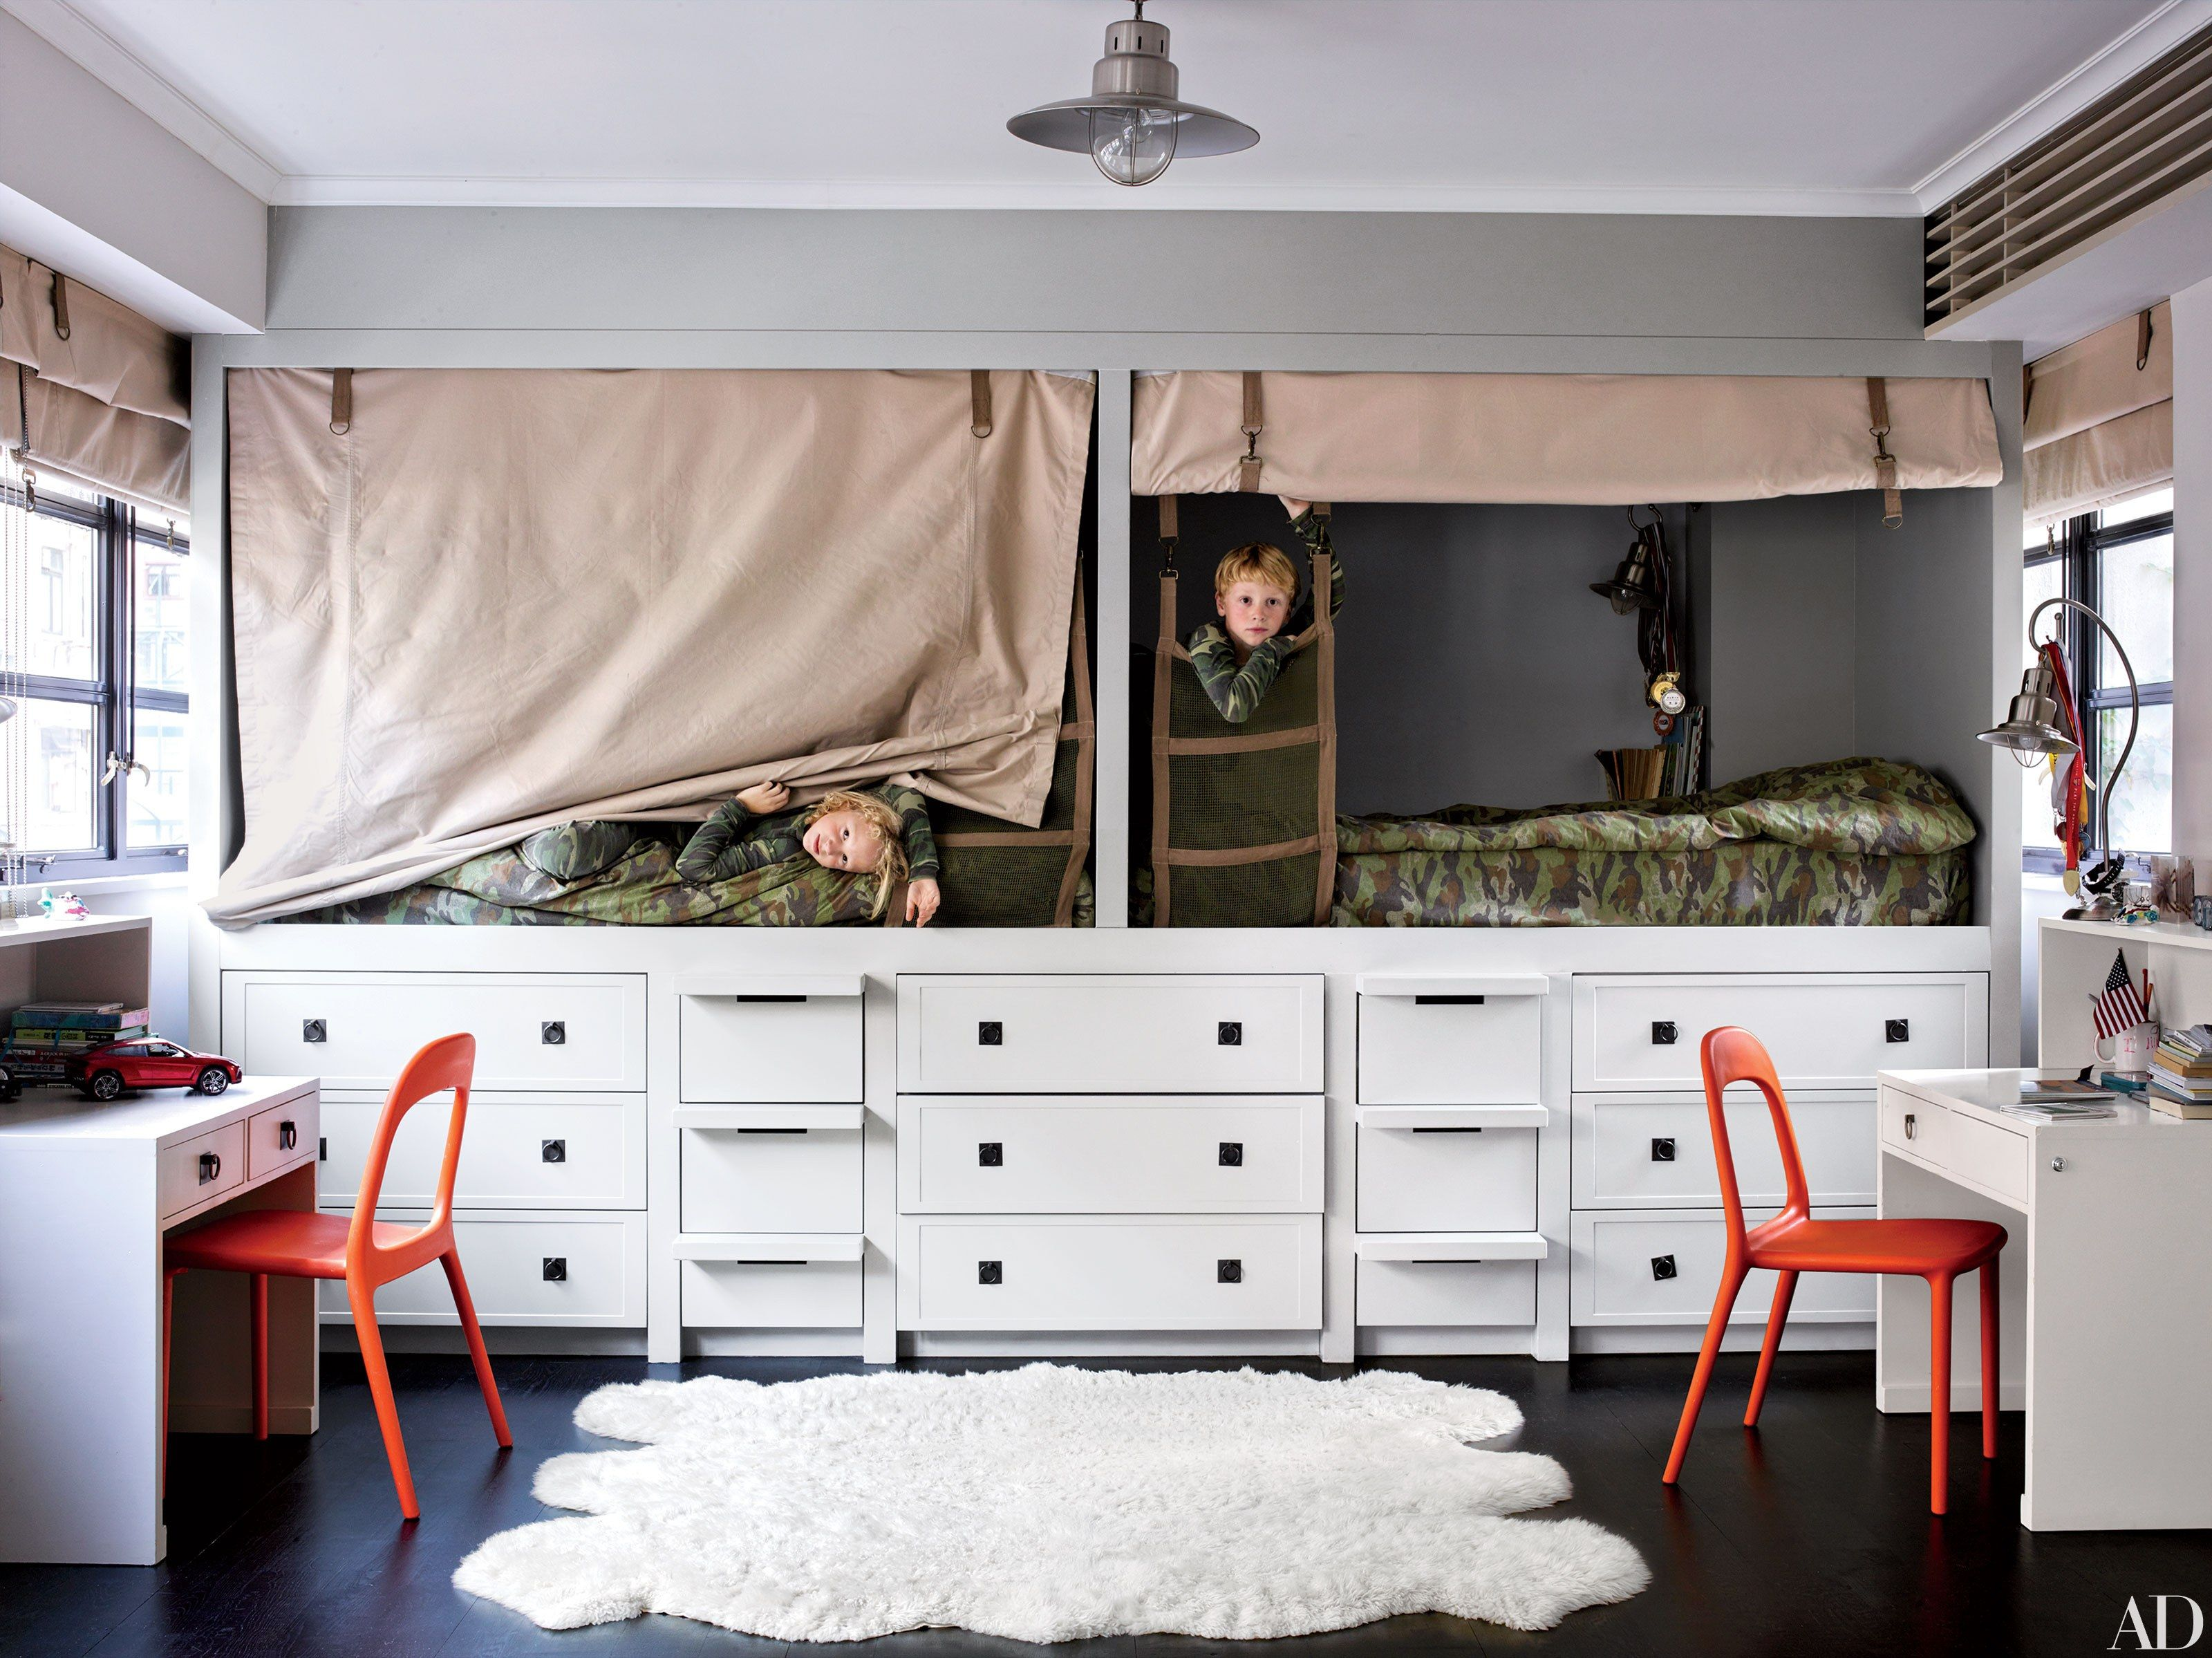 21 Cozy Beds Nestled In Wall Nooks. Bunk RoomsBasement BedroomsBedroom  ClosetsWall ...